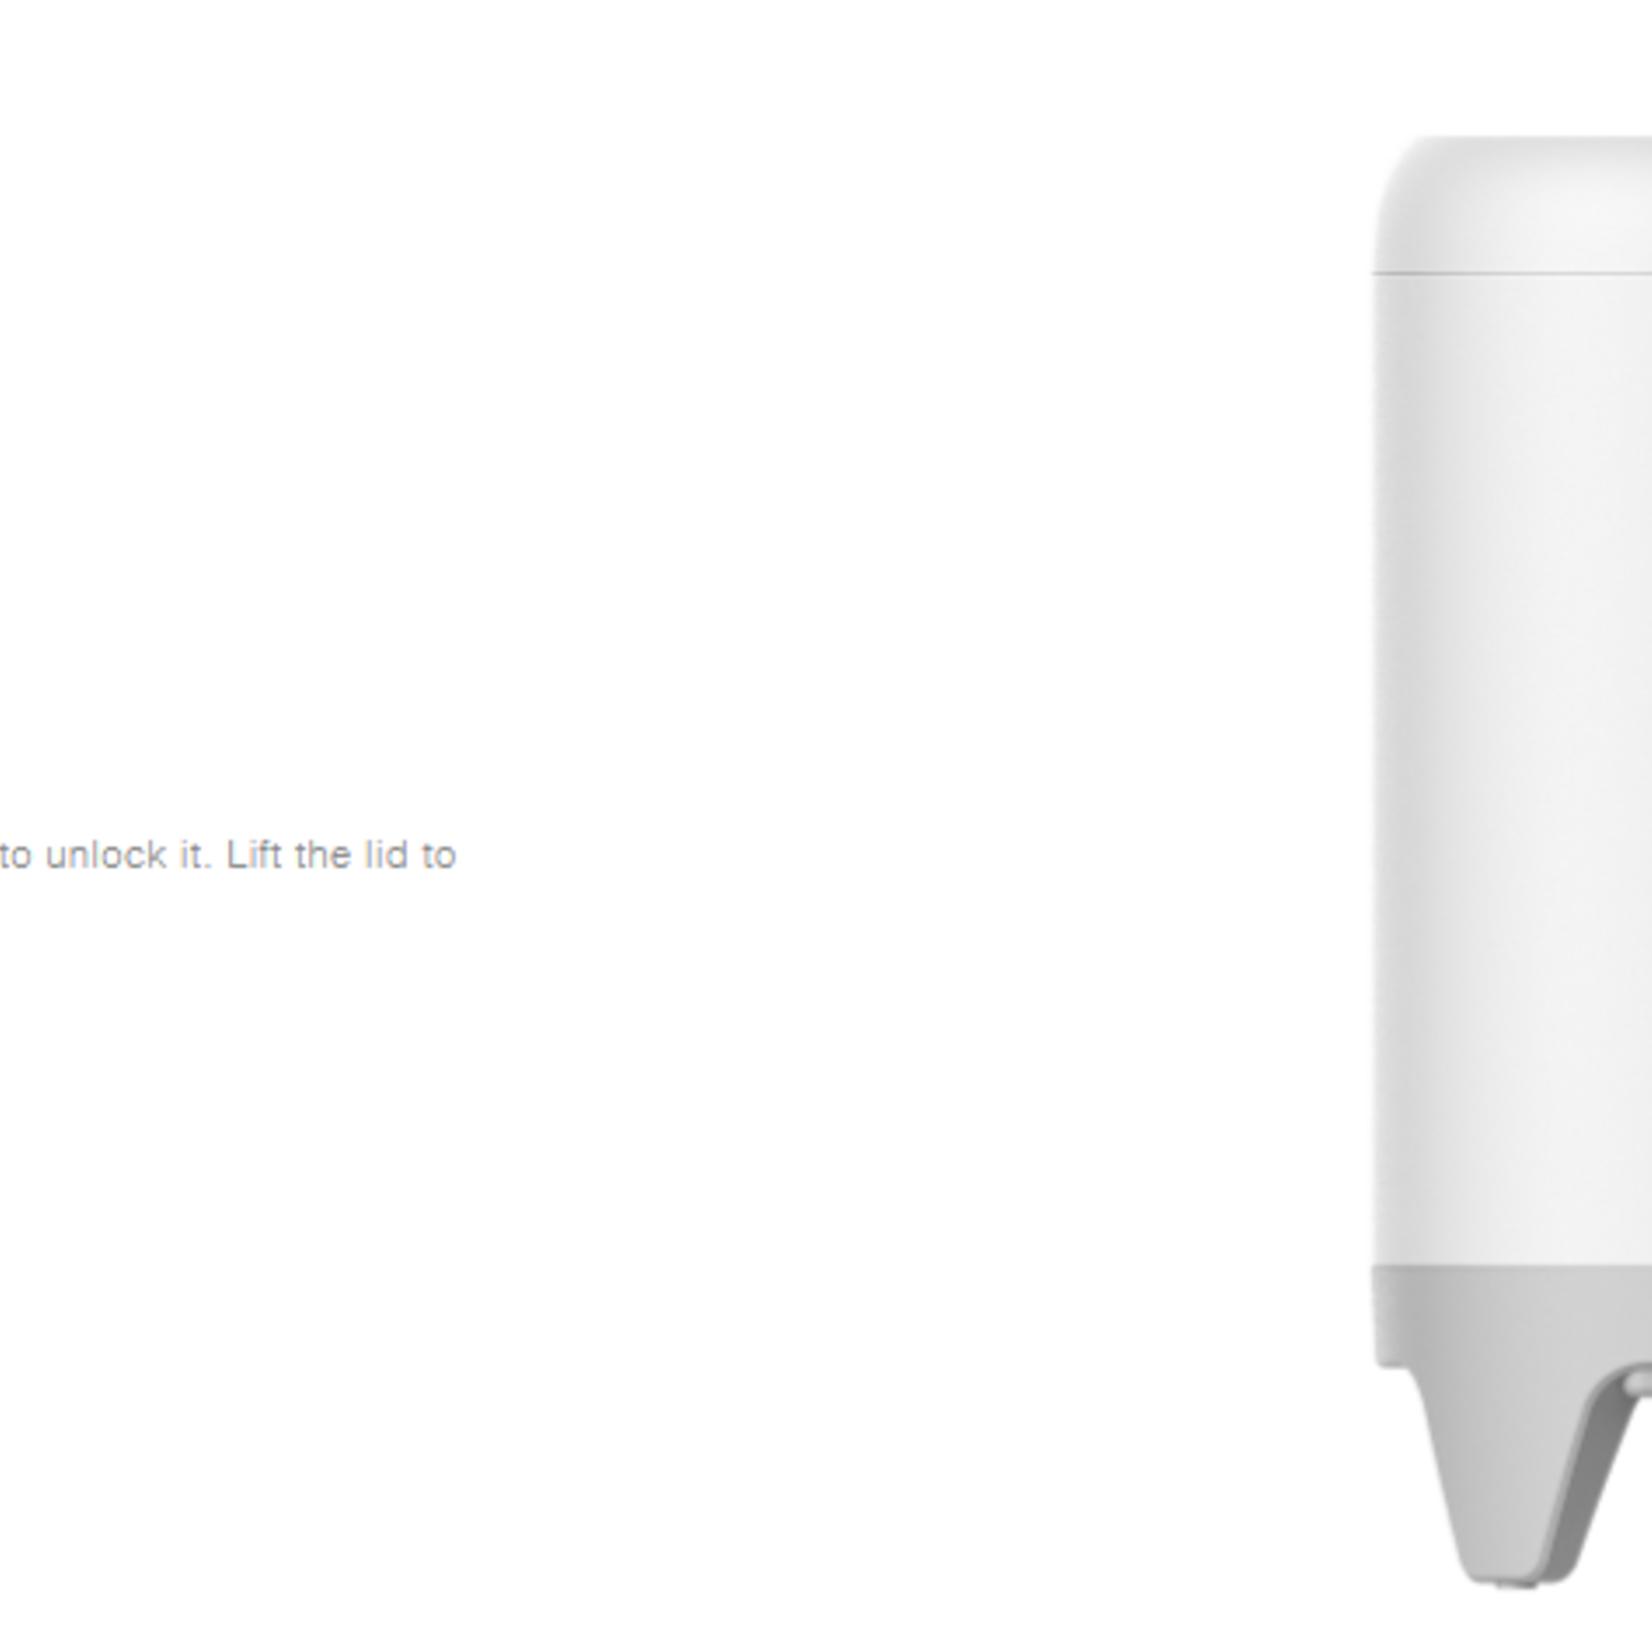 Petkit PURA X Smart Litter Box